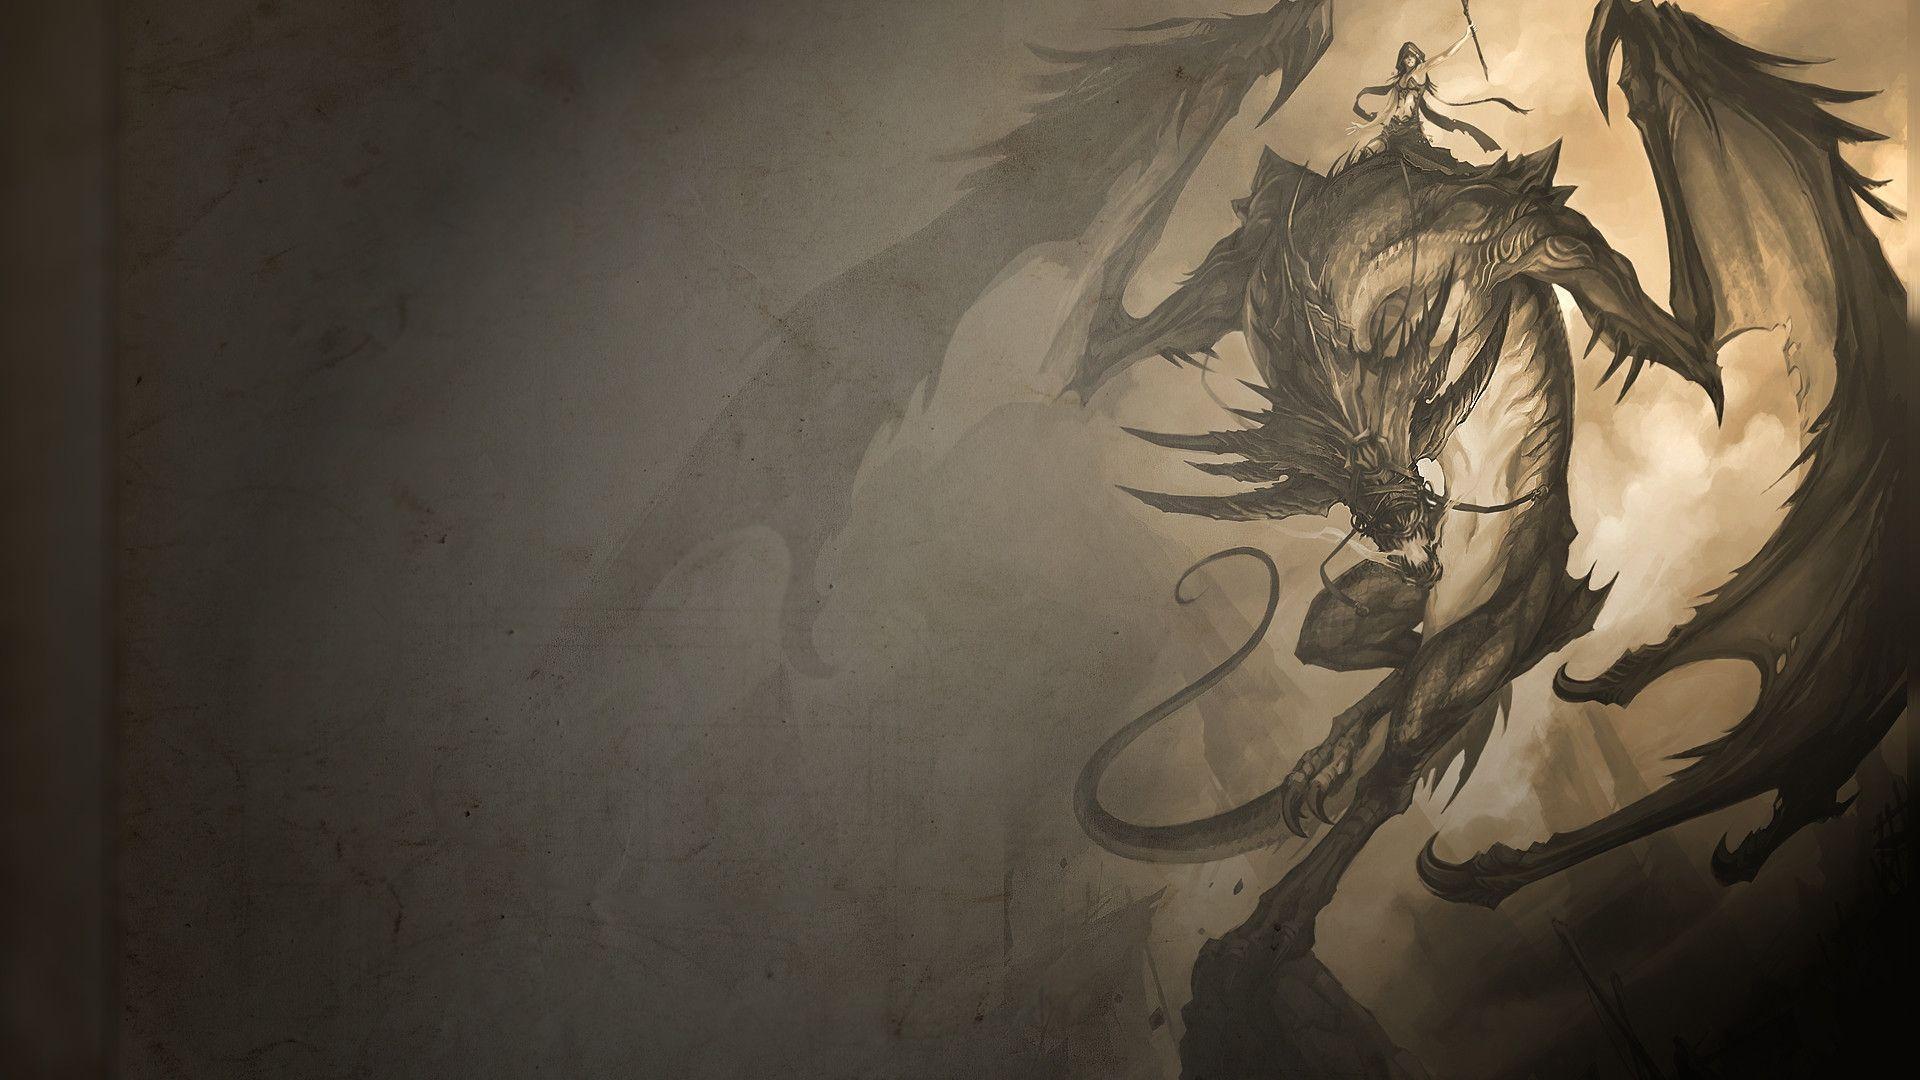 Hd Dragon Wallpapers Top Free Hd Dragon Backgrounds Wallpaperaccess